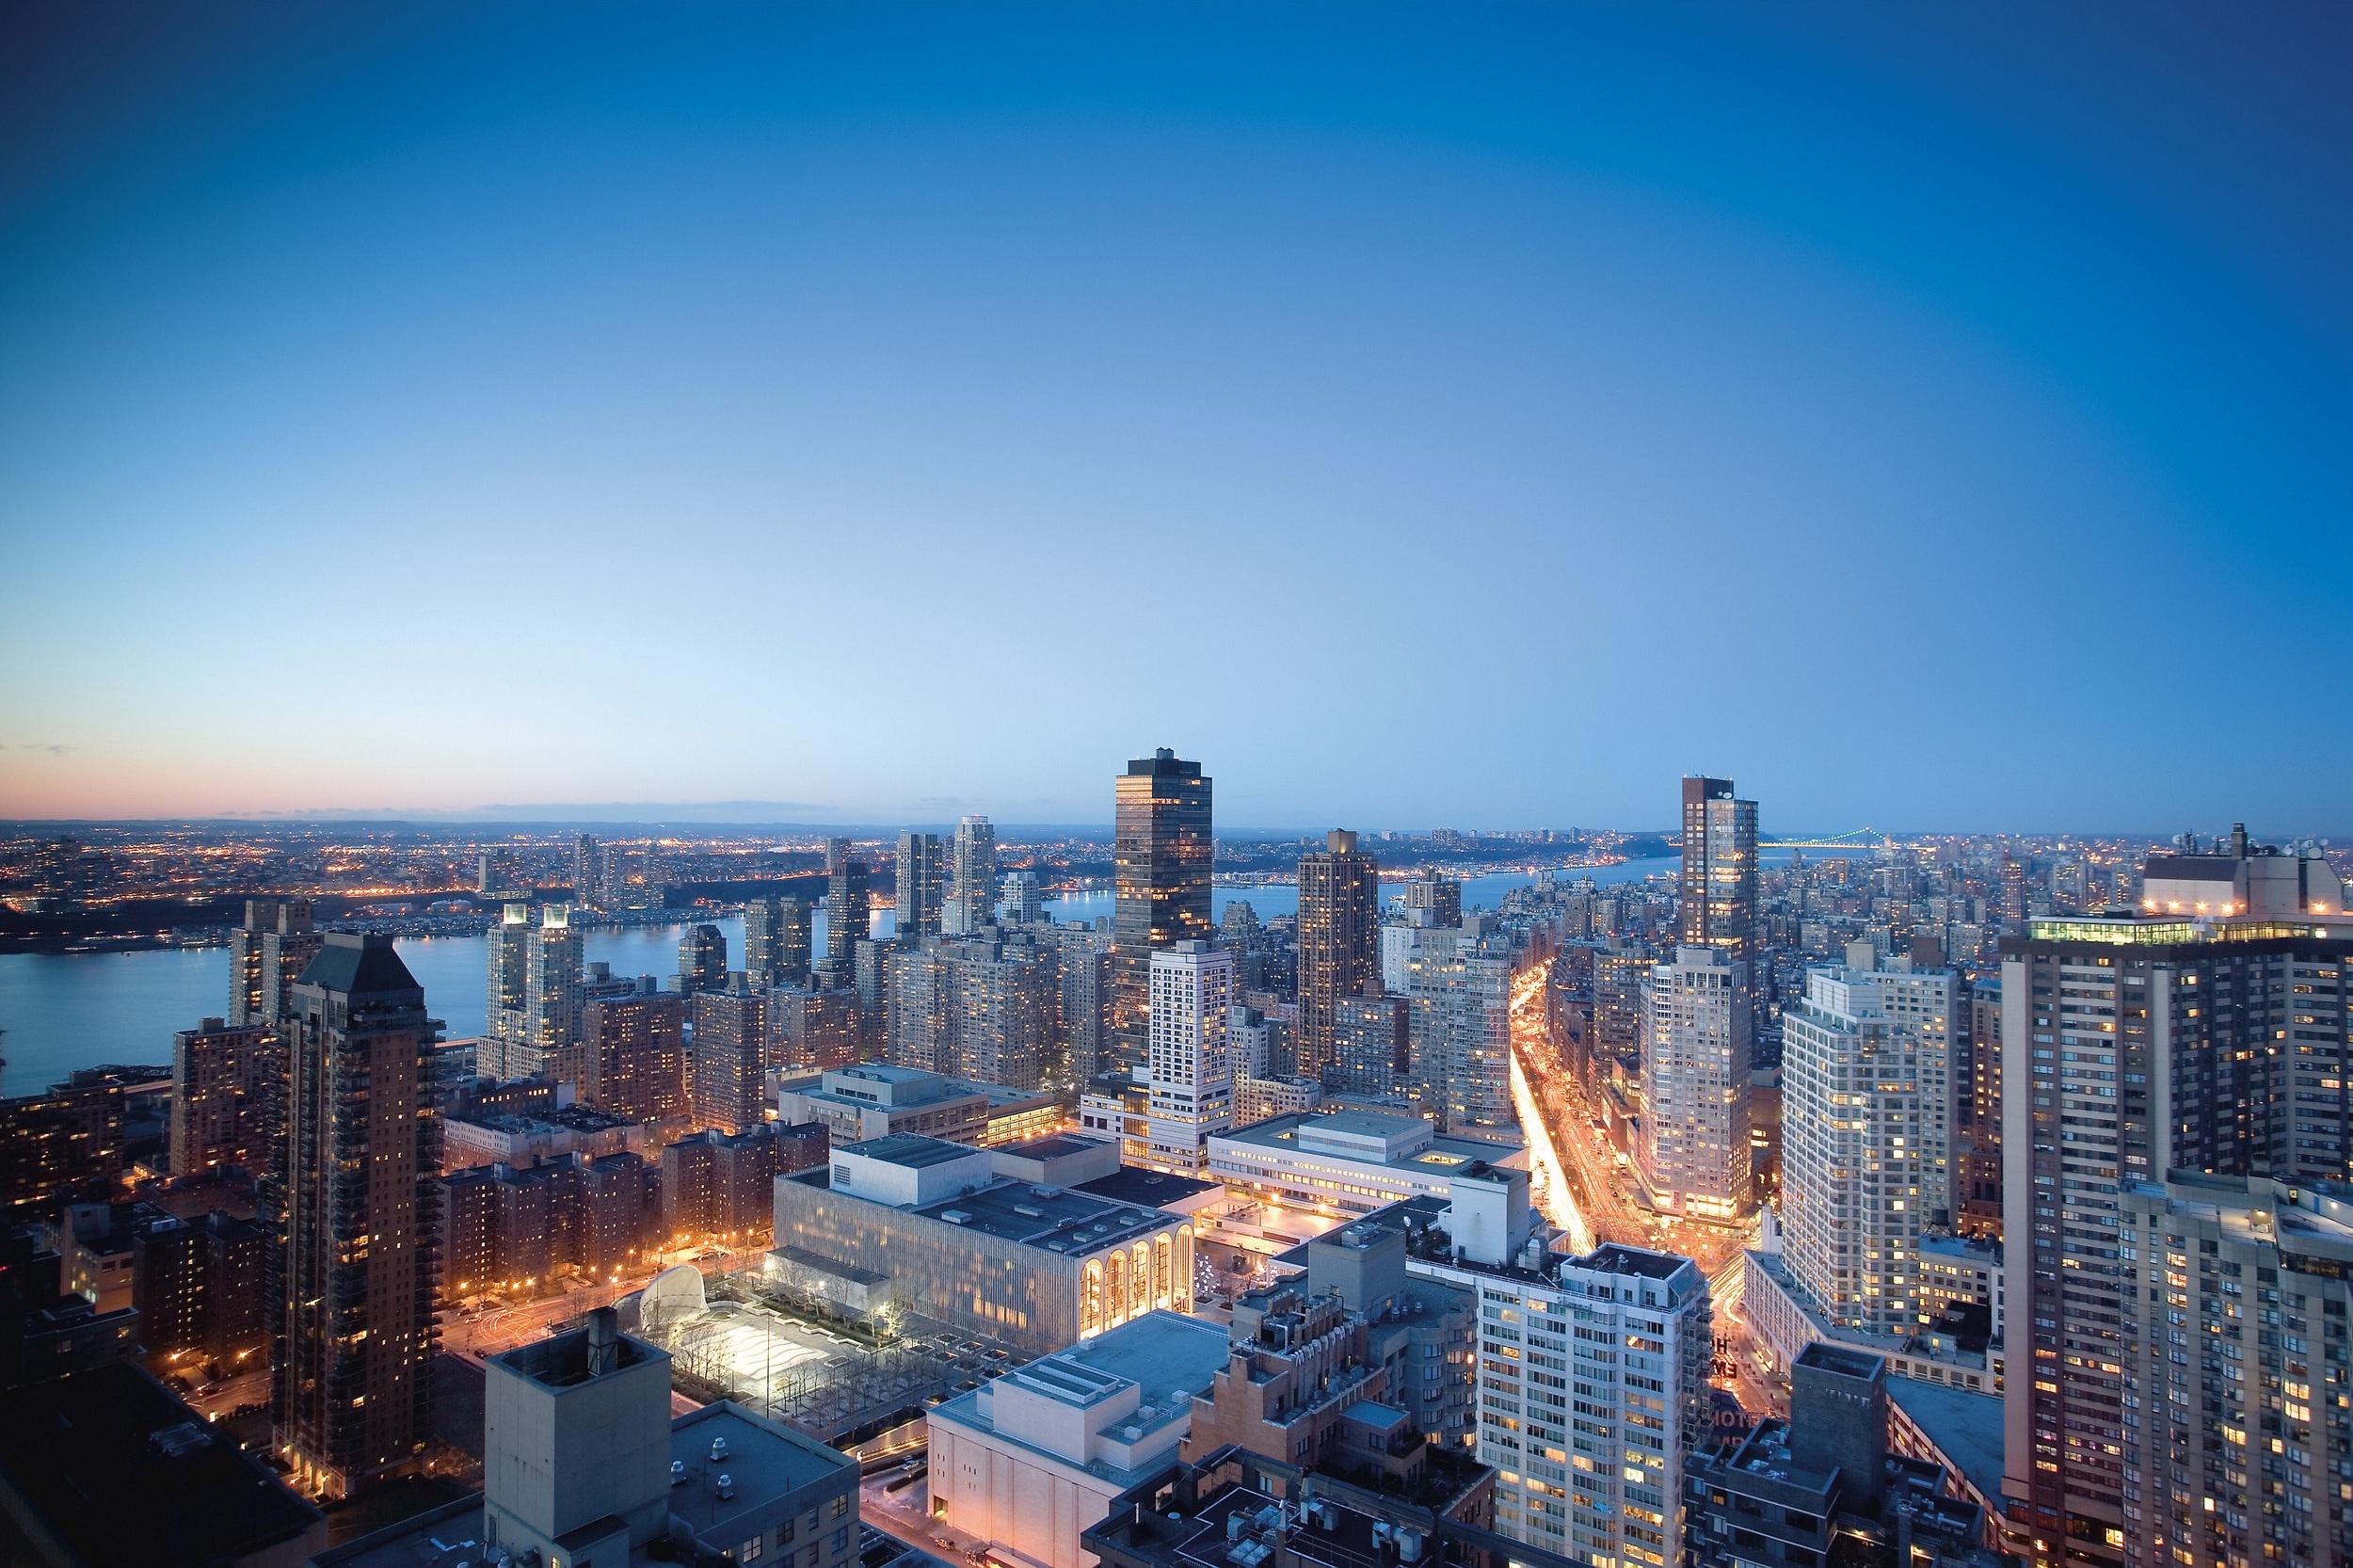 Photo: Mandarin Oriental, New York - New York, New York